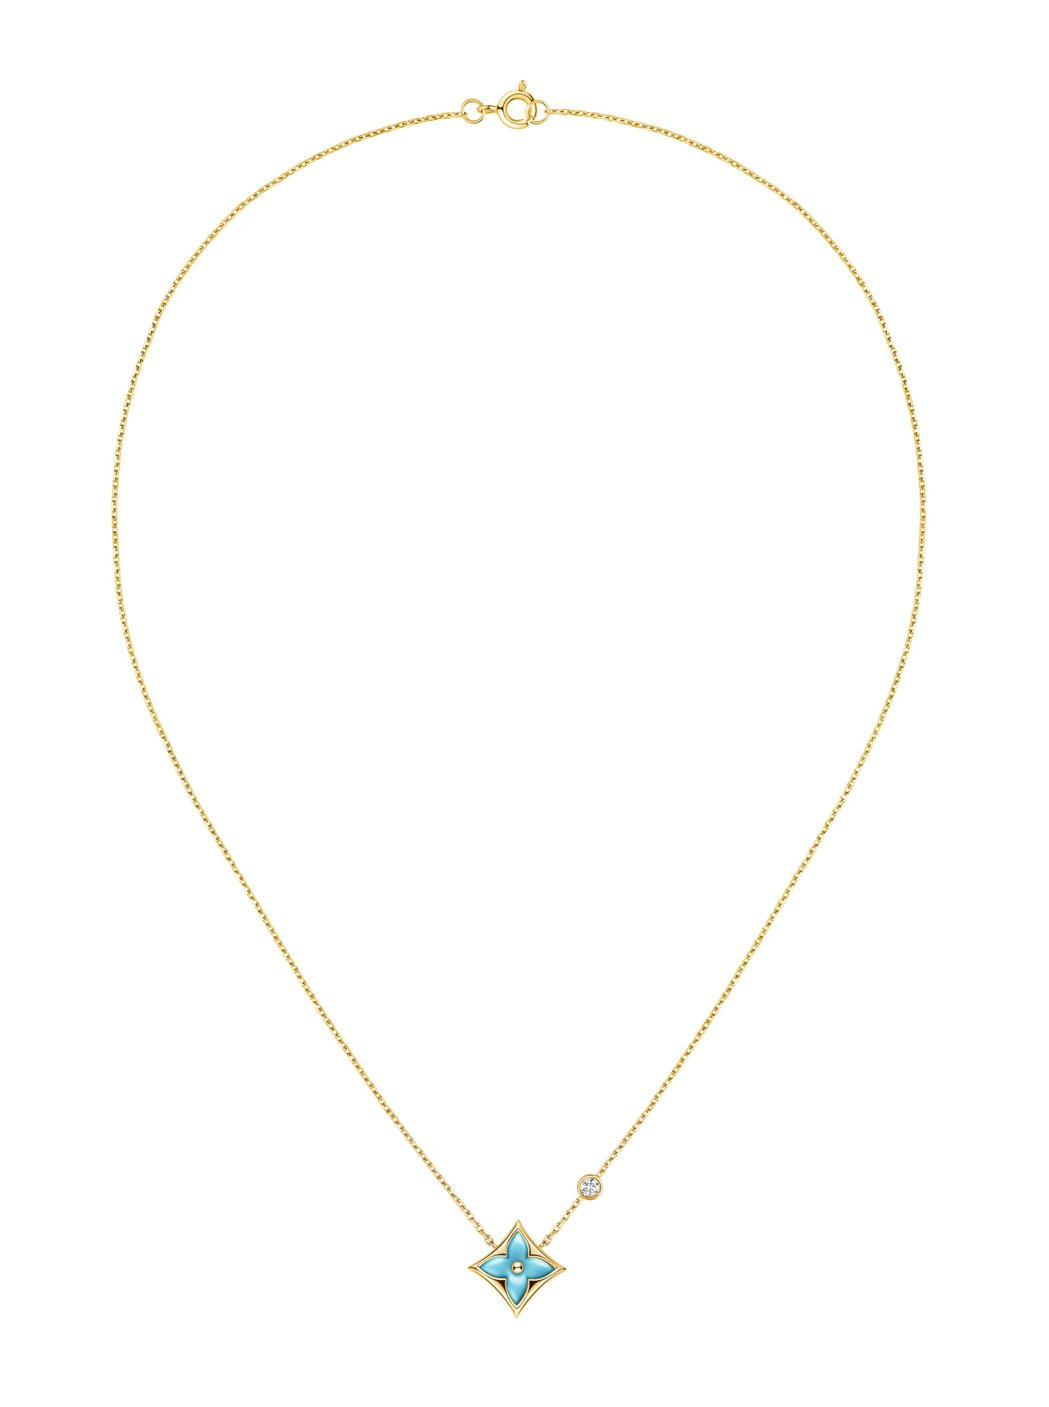 Star Blossom土耳其石項鍊,價格電洽。圖/LV提供